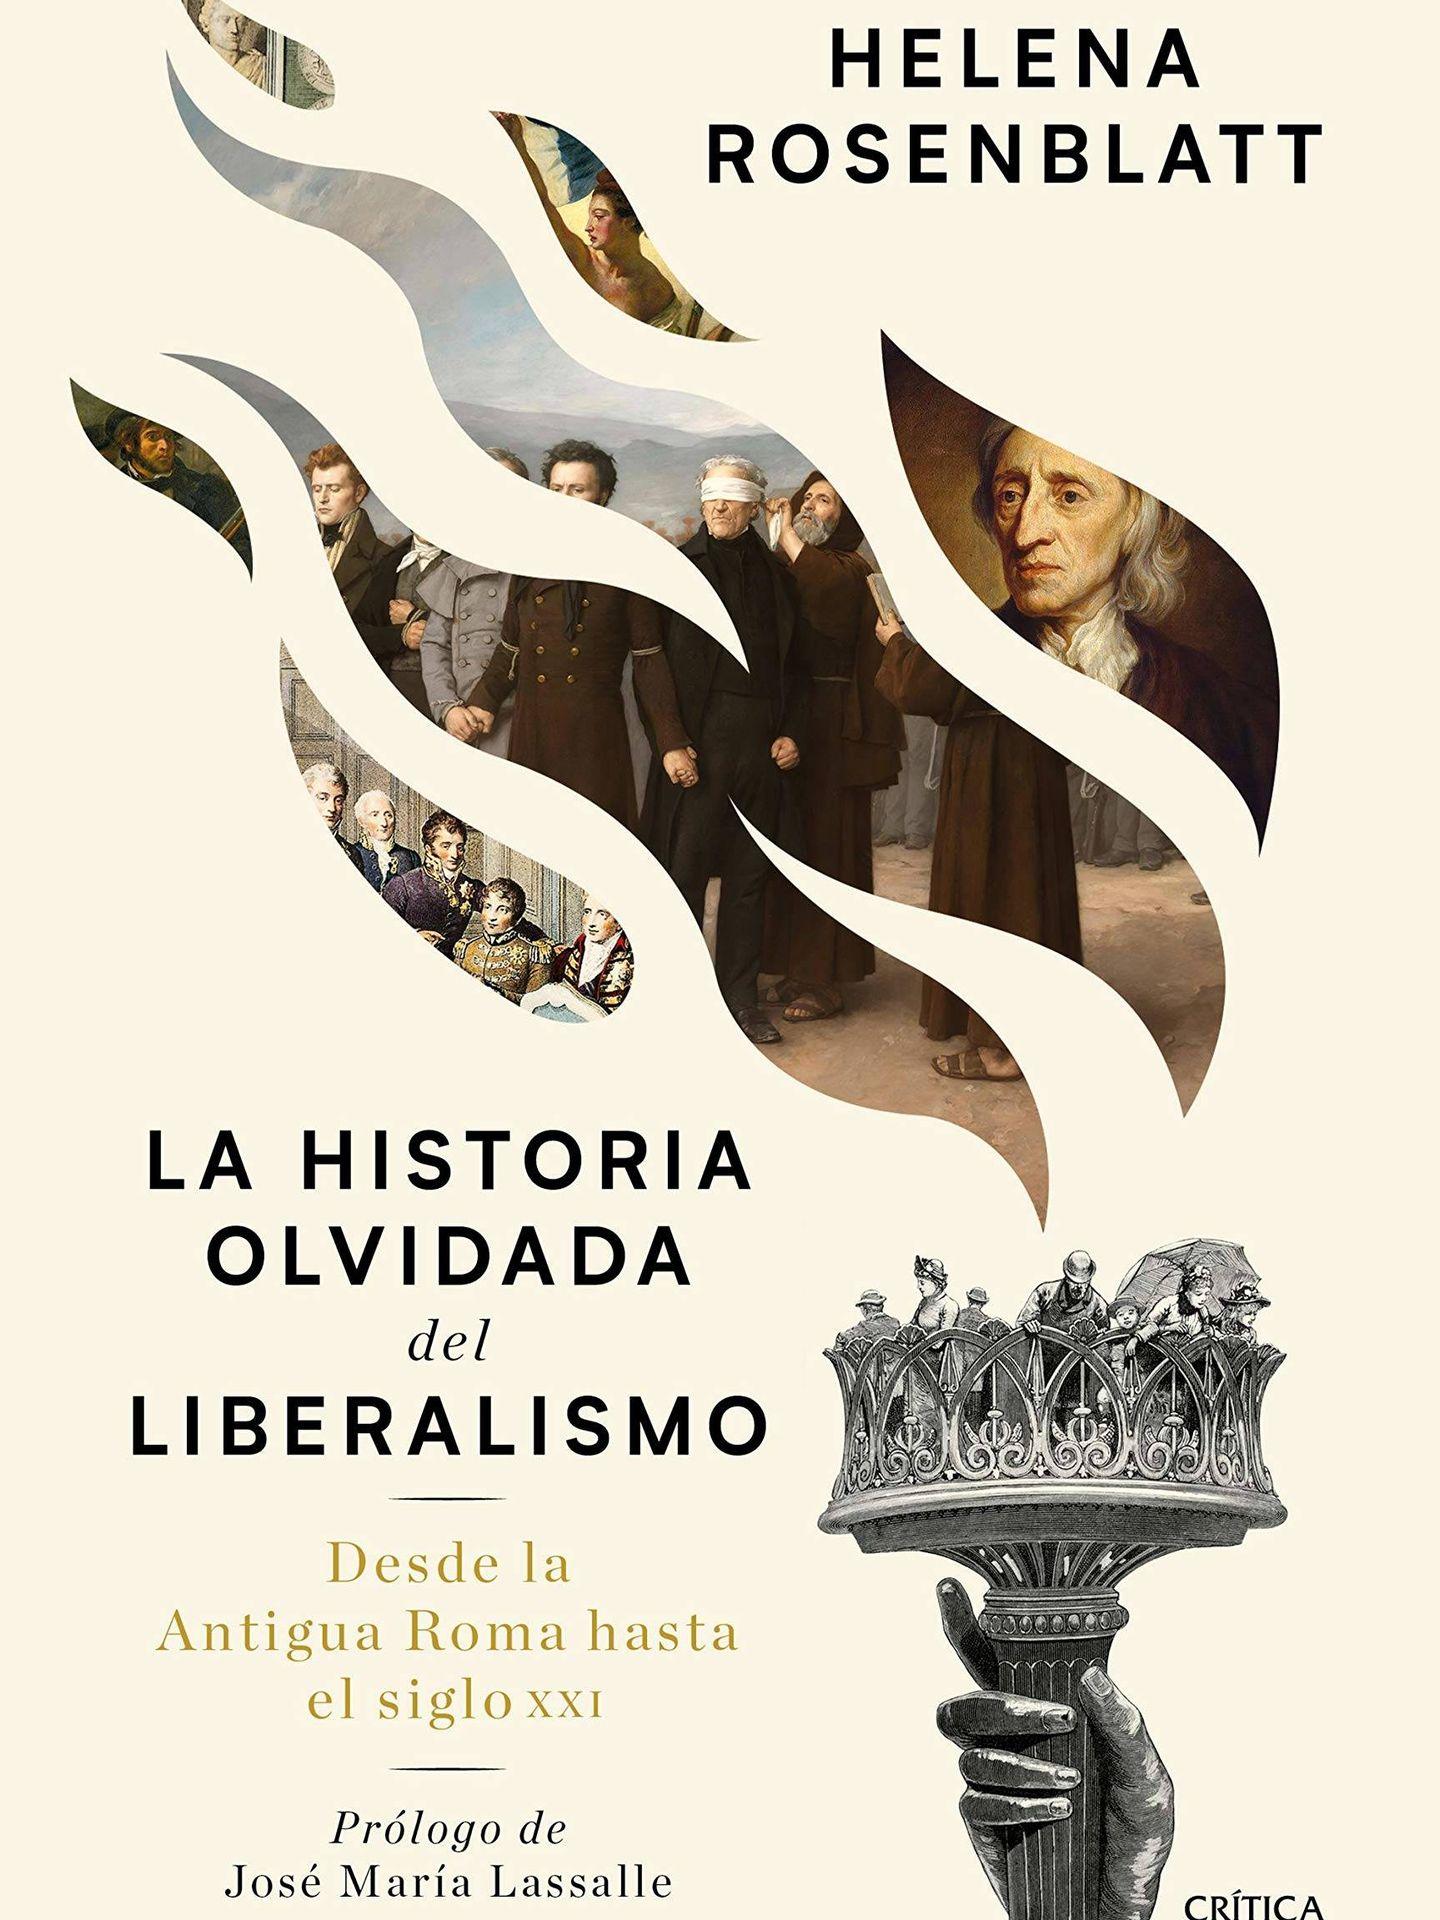 'La historia olvidada del liberalismo' (Crítica).